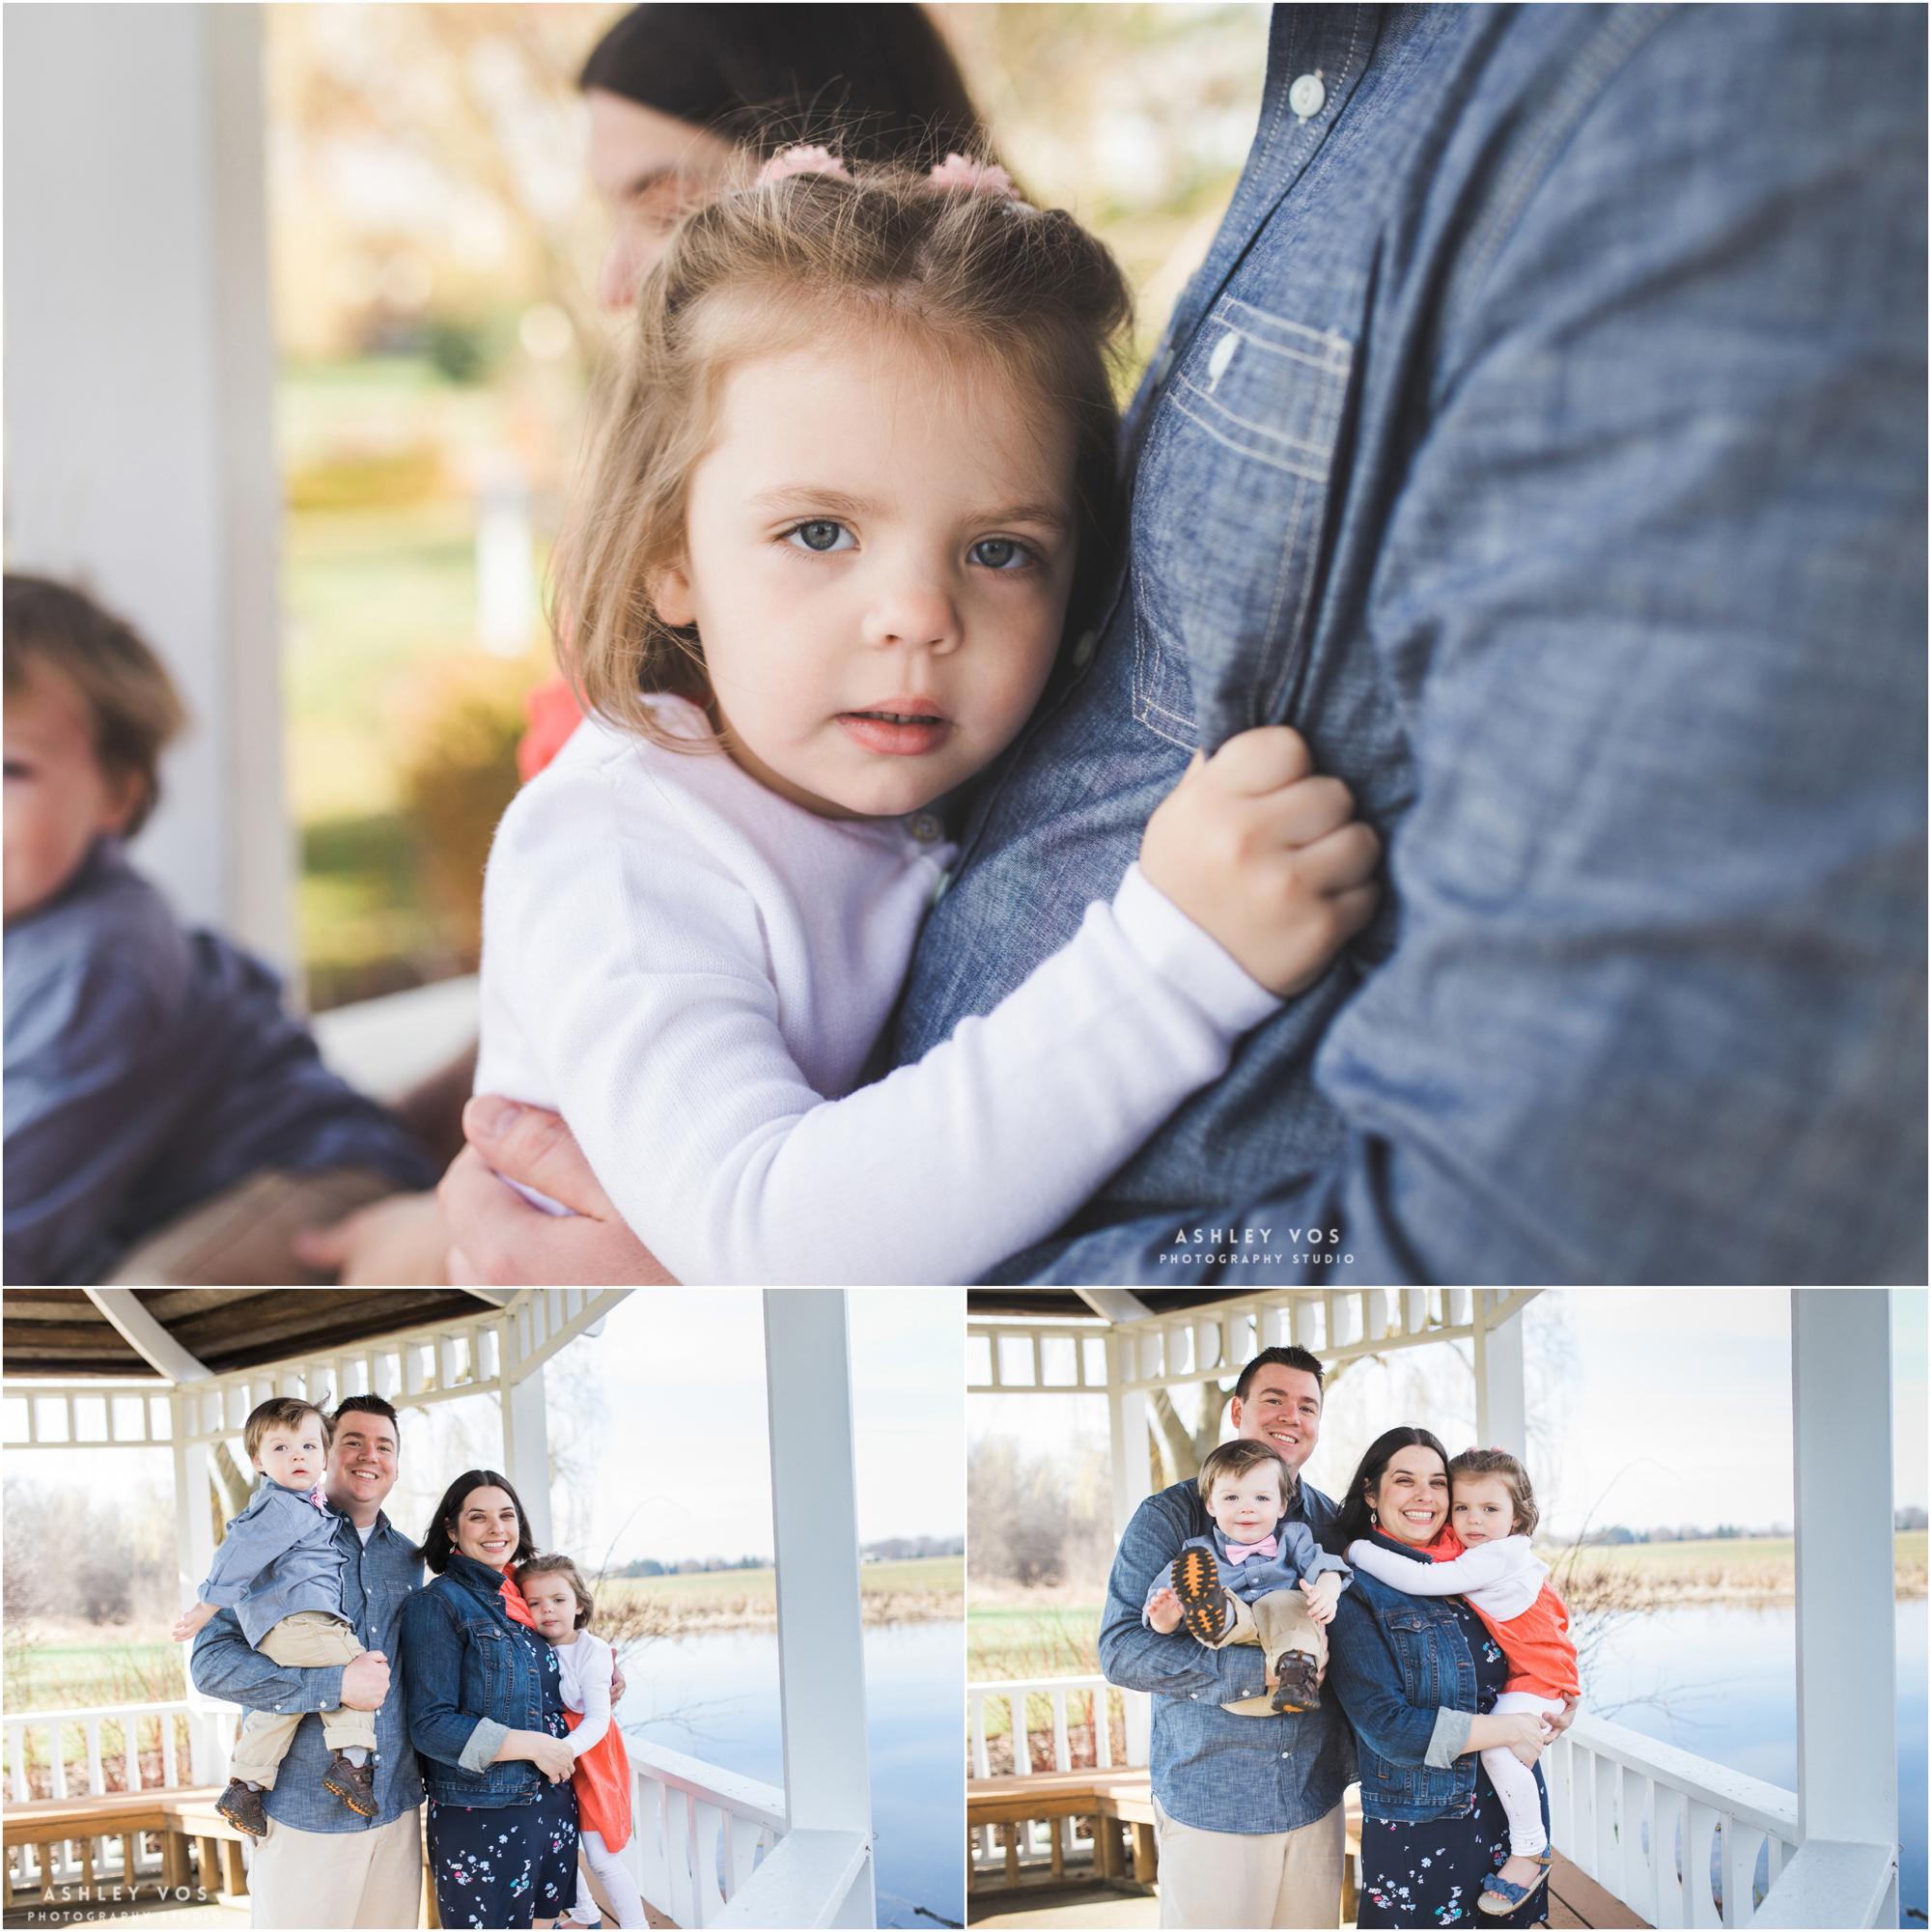 Ashley Vos Photography Seattle Lifestyle Family Photography_0033.jpg